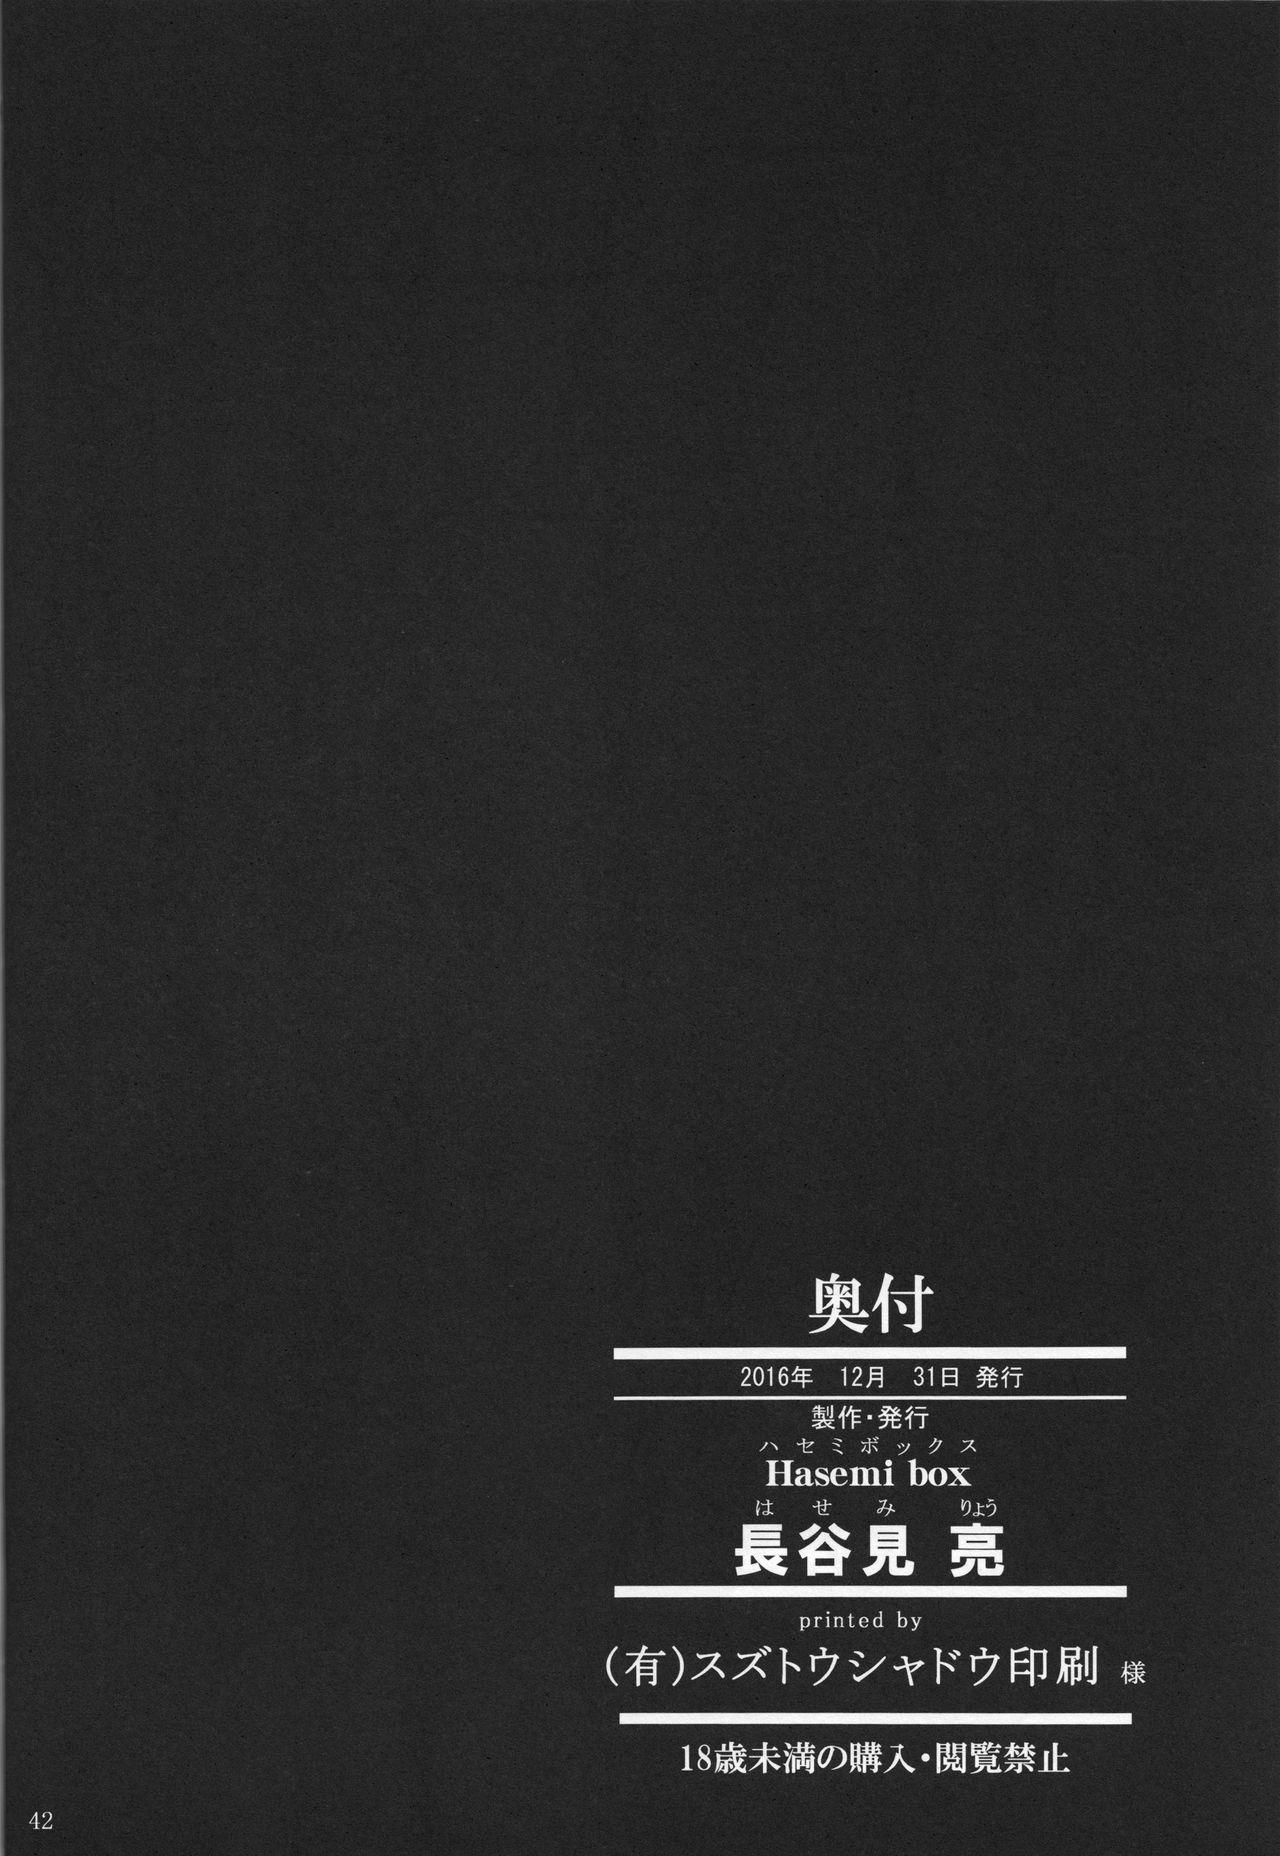 Onee-chan to Shota no Witch Night 40